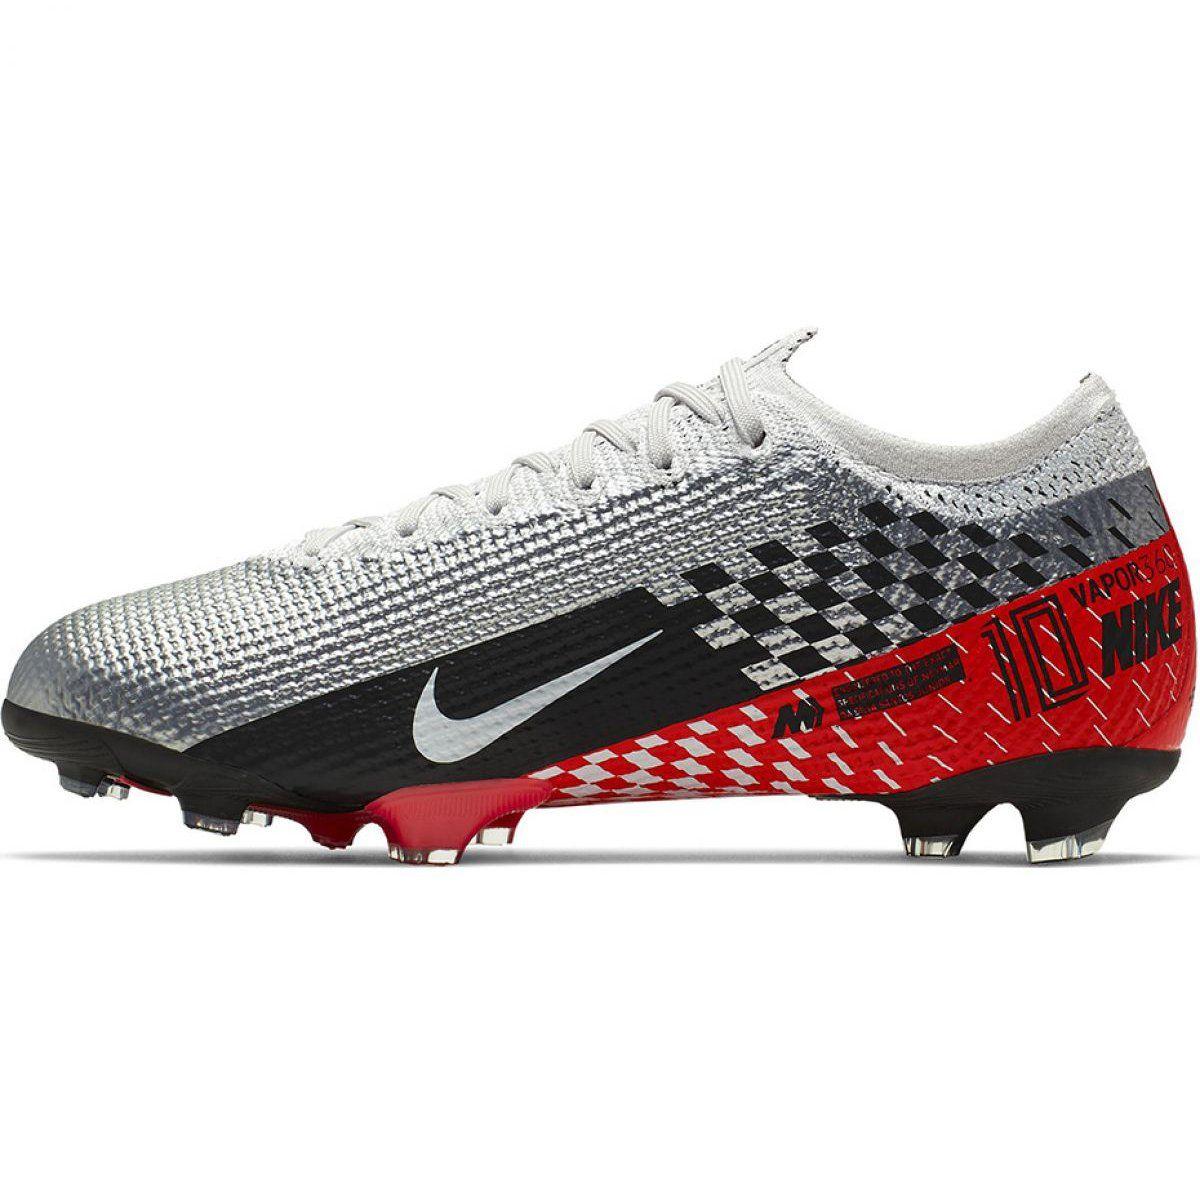 Buty Pilkarskie Nike Mercurial Vapor 13 Elite Neymar Fg Jr At8035 006 Czarne Sport Shoes Nike Shoes